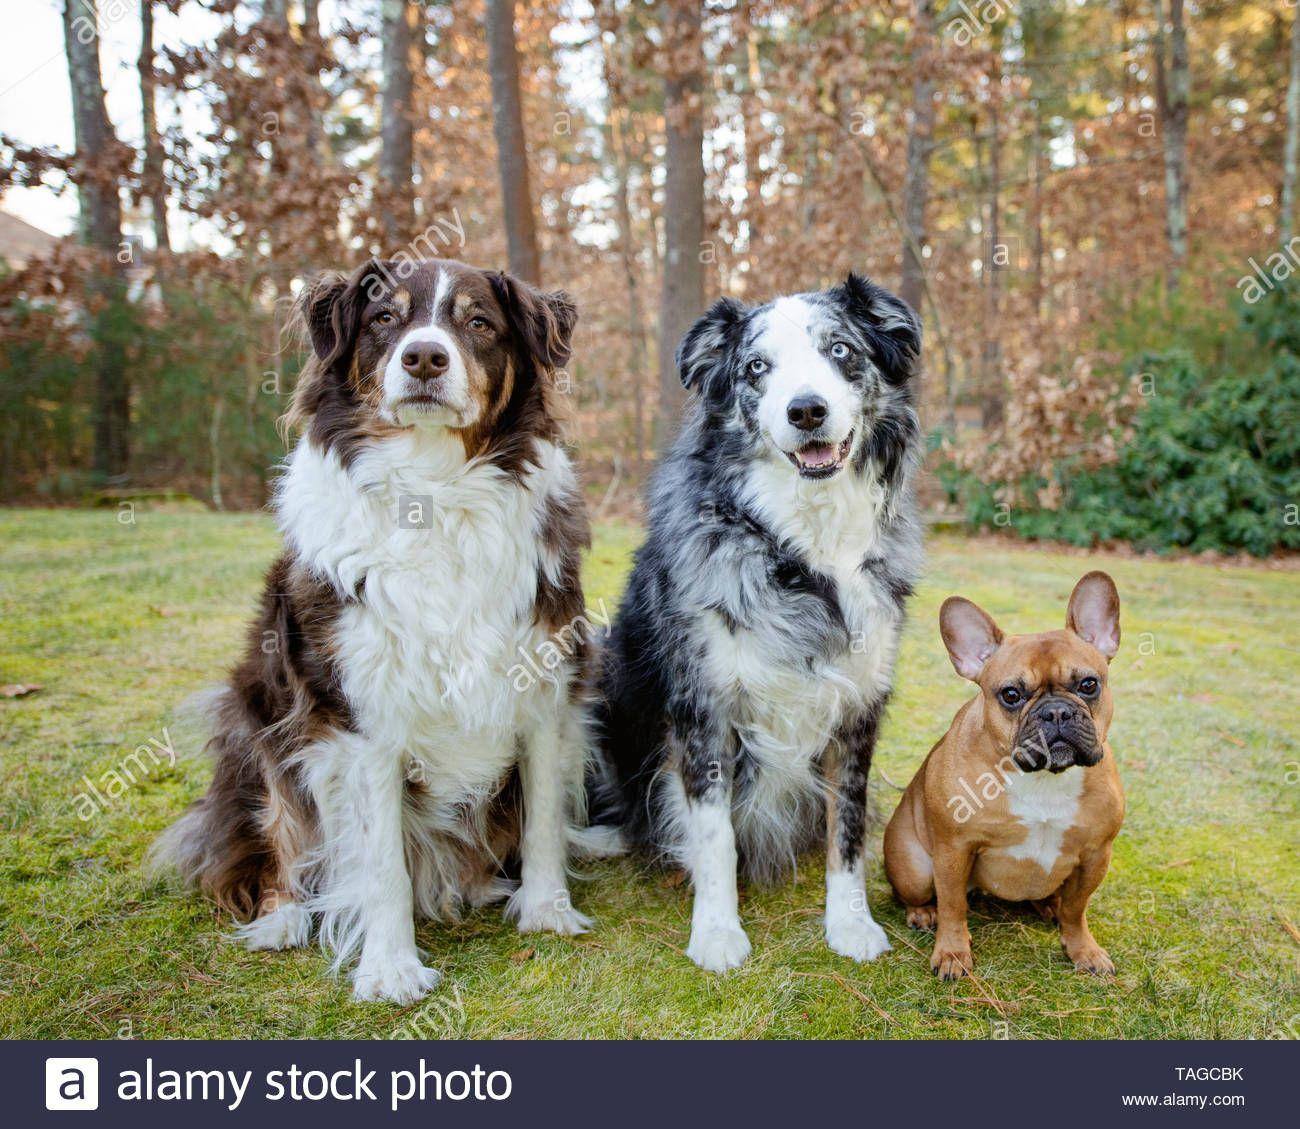 77+ Blue Merle French Bulldog Puppy in 2020 Bulldog